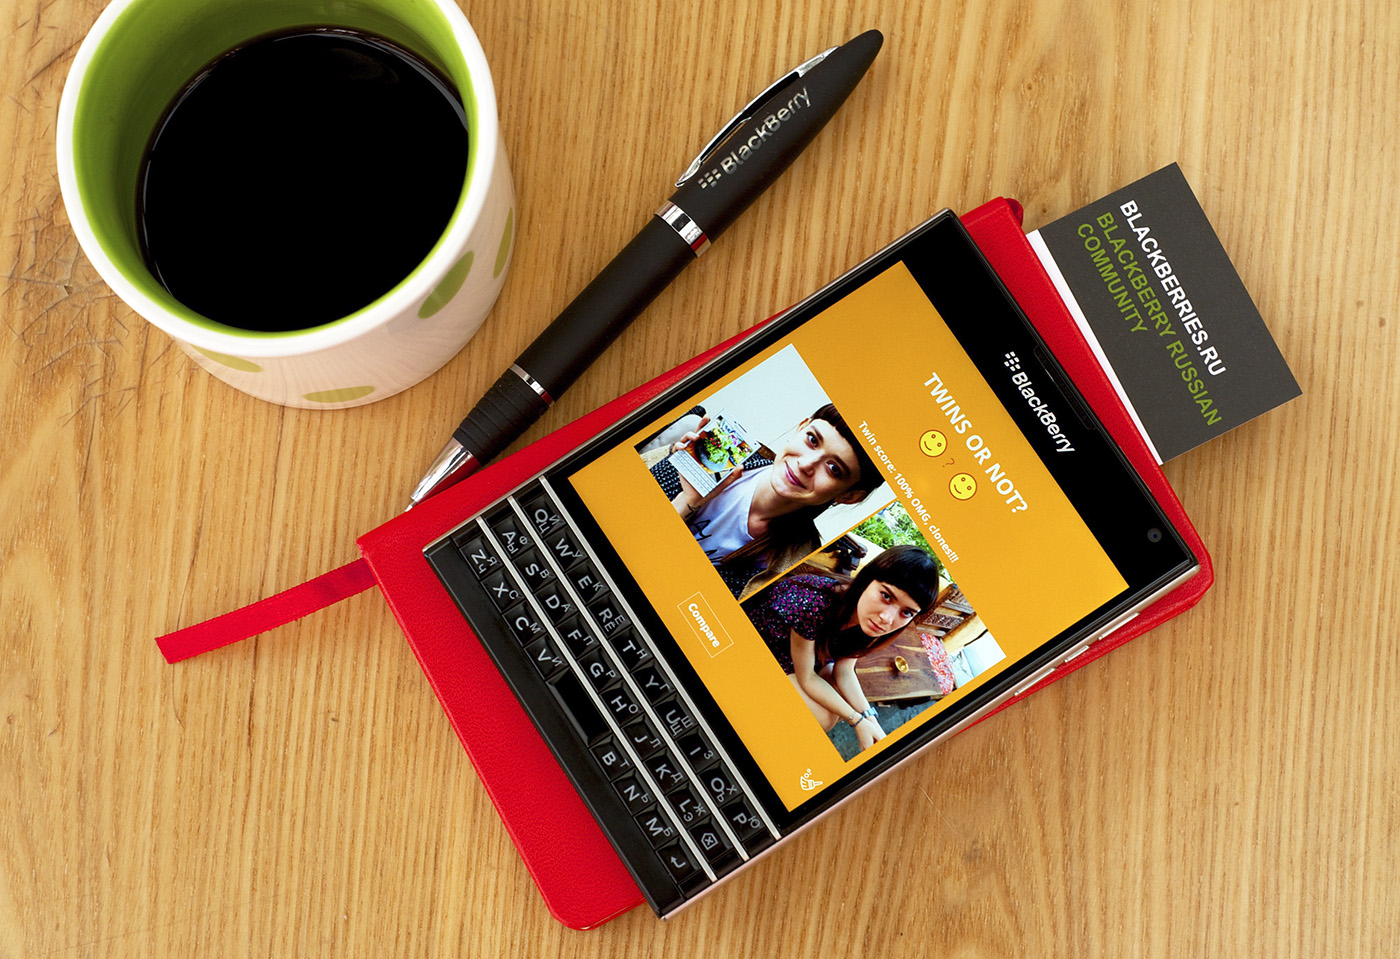 BlackBerry-Classic-Apps-3